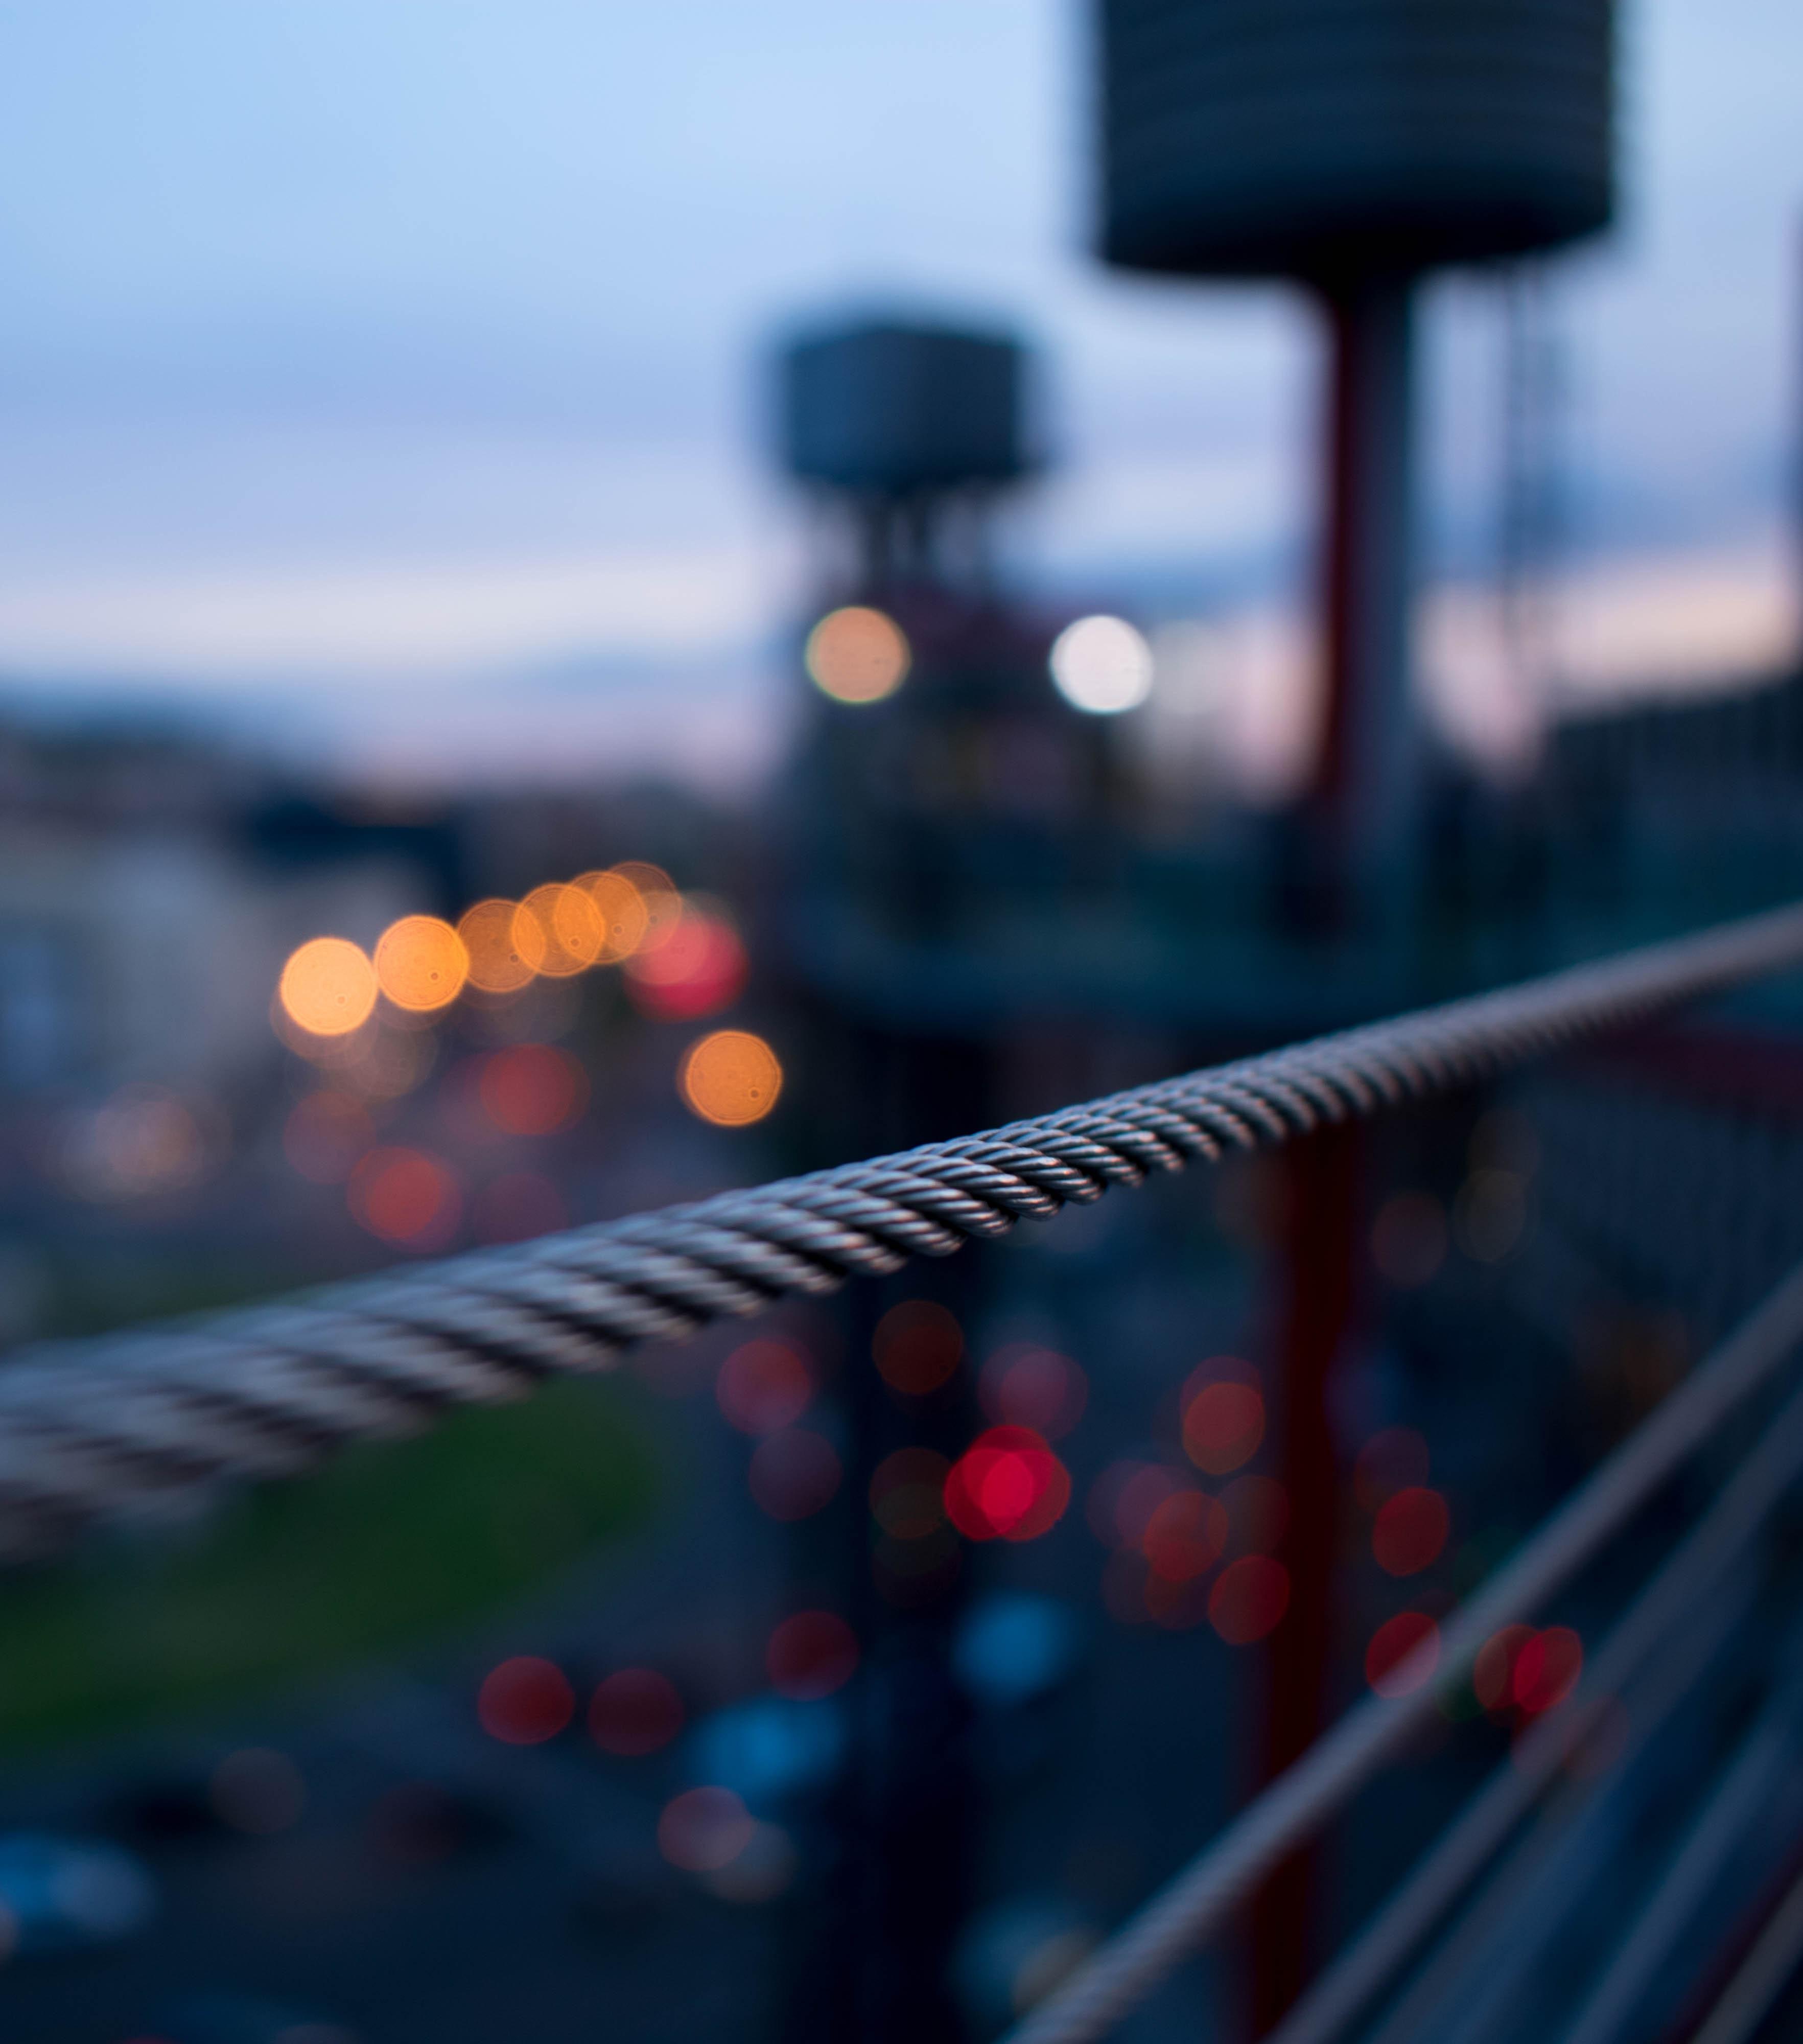 City Blur Background Full Hd